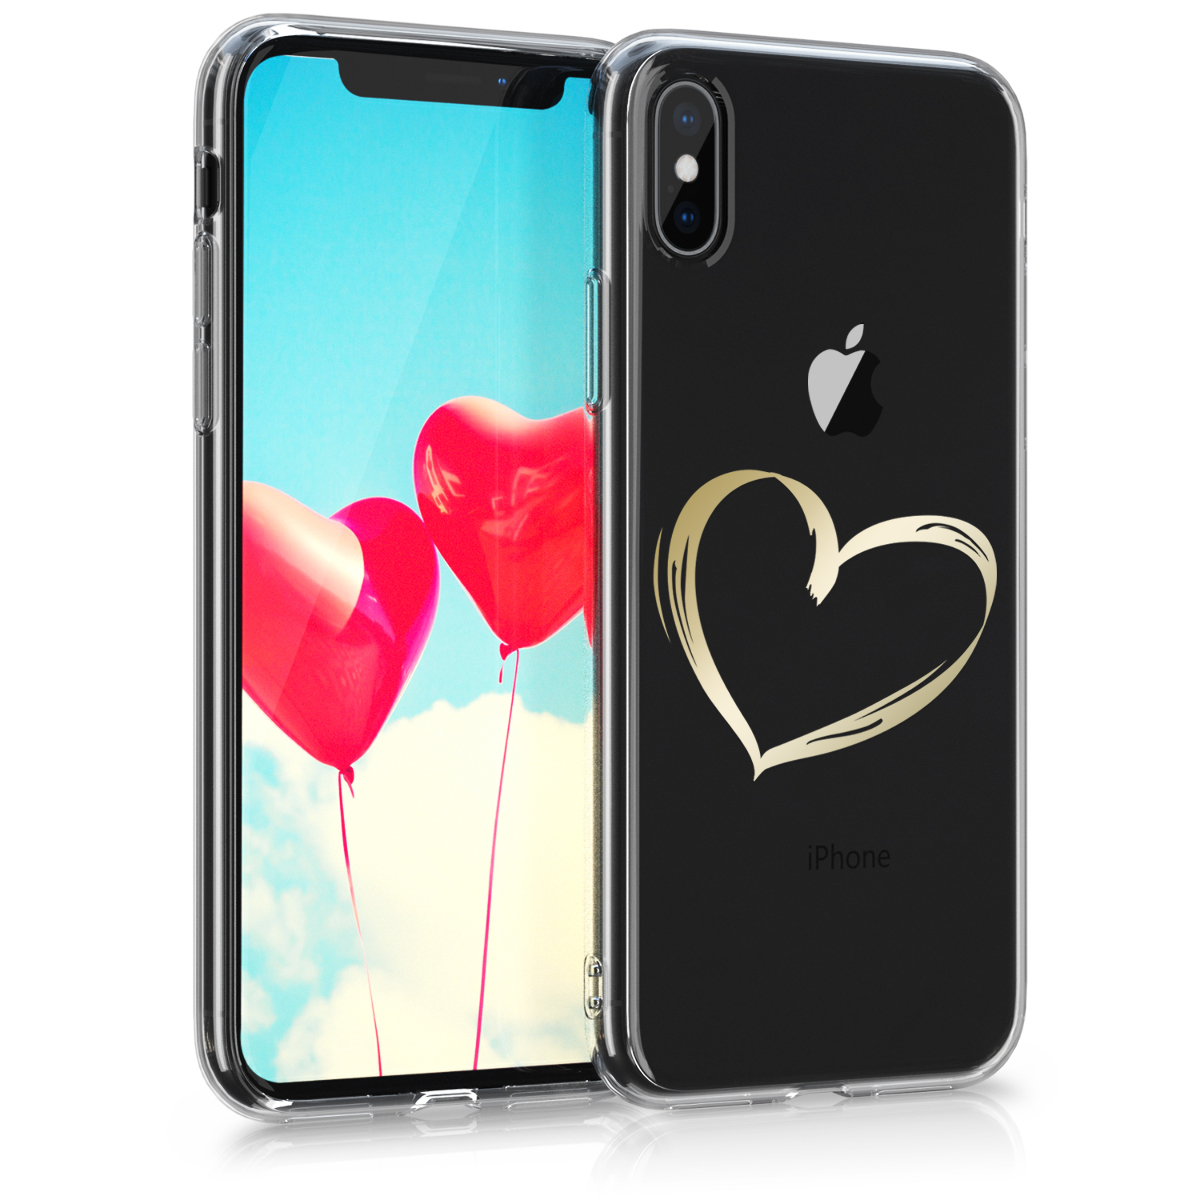 Kvalitní silikonové TPU pouzdro pro Apple iPhone X - Brushed Heart Gold | Transparent